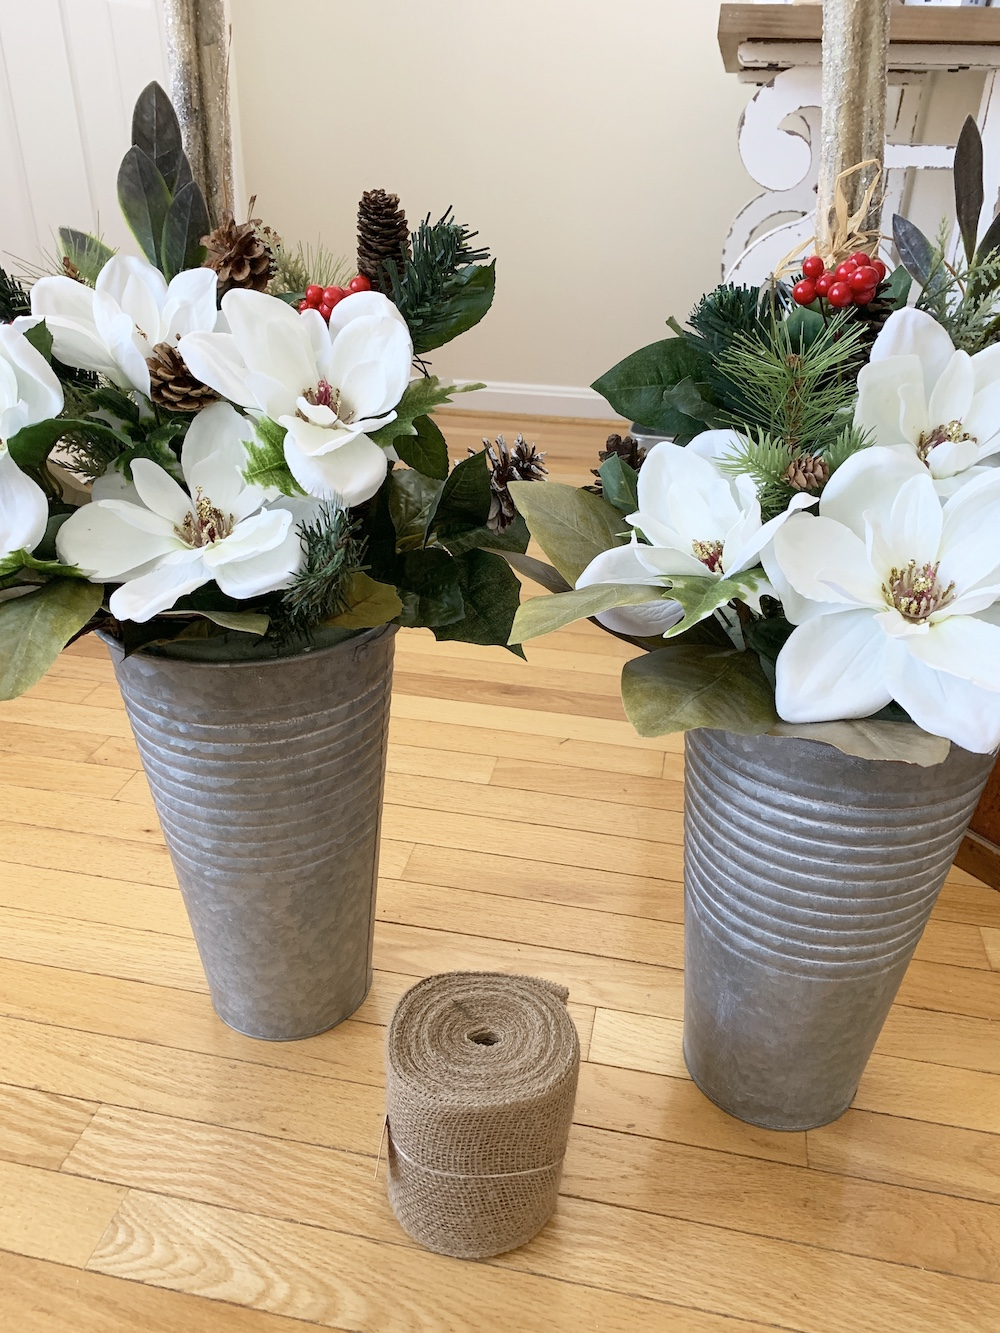 DIY Decor Floral Magnolia and Green Pine Mix in Buckets #DIY #DIYChristmasDecor #ChristmasDecor #ChristmasEntrywayDecor #DIYFrenchFloralBucketDecor #FrenchFloralBucketDecor #GalvanizedFloralBucketDecor #DecorTutorial